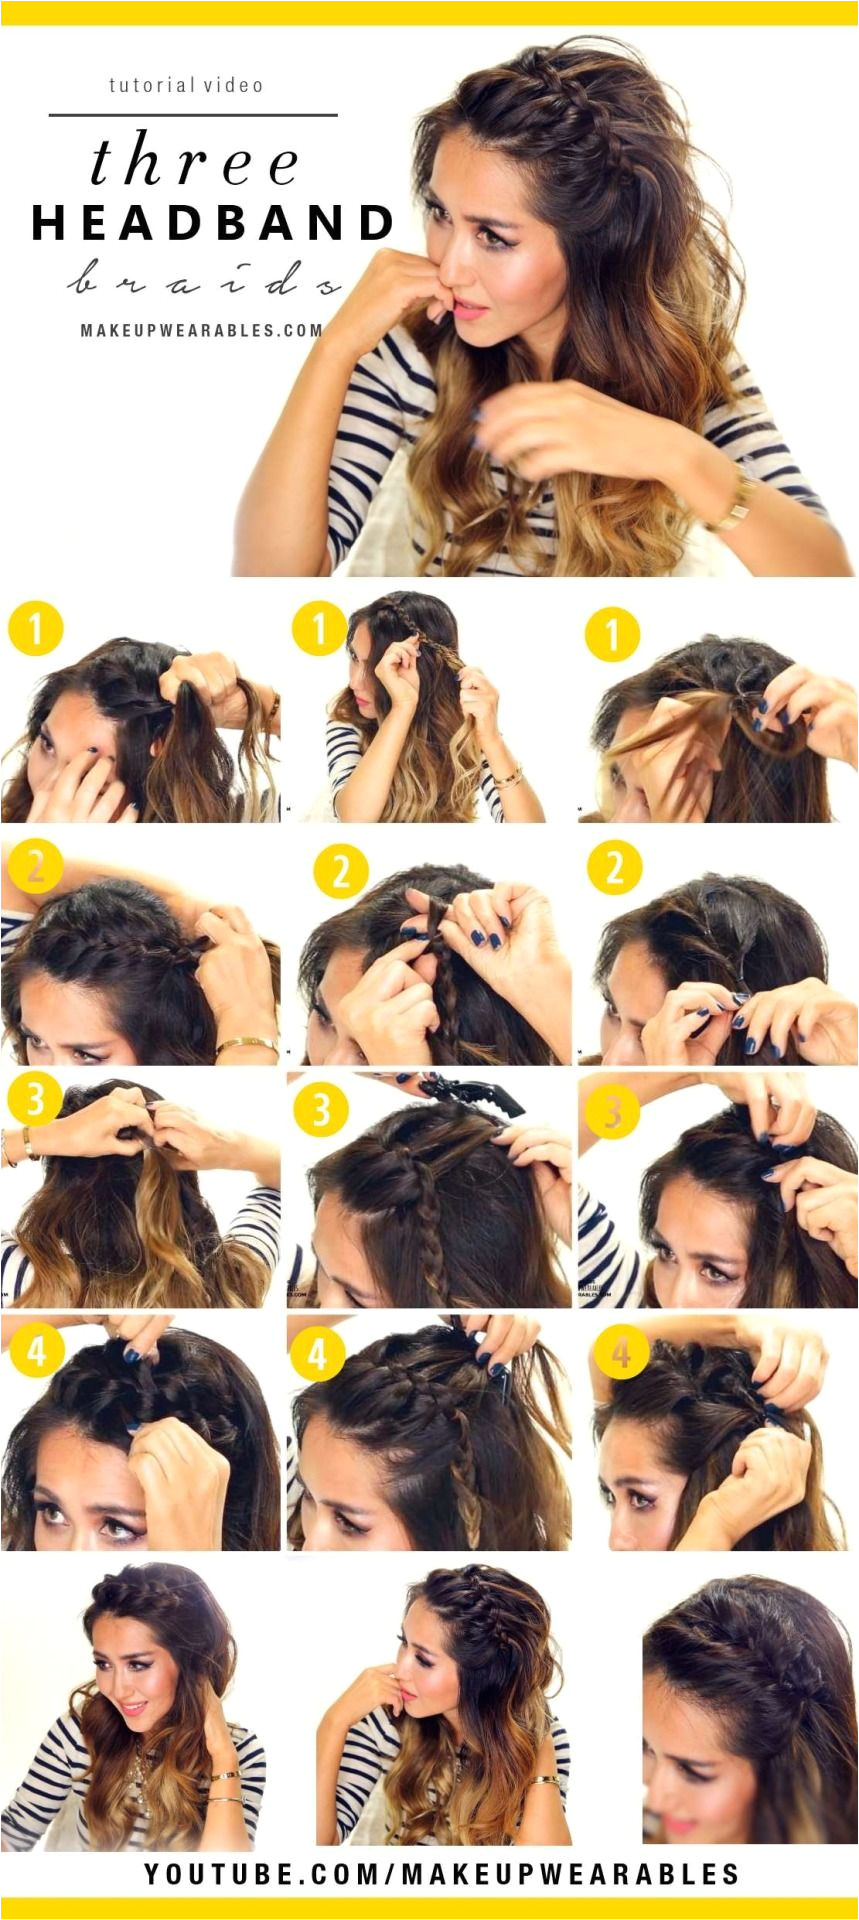 "makeupwearableshairstyles "" How to 3 Easy Headband Braid Hairstyles Tutorial Cute braided half up half down updos for school work everyday """